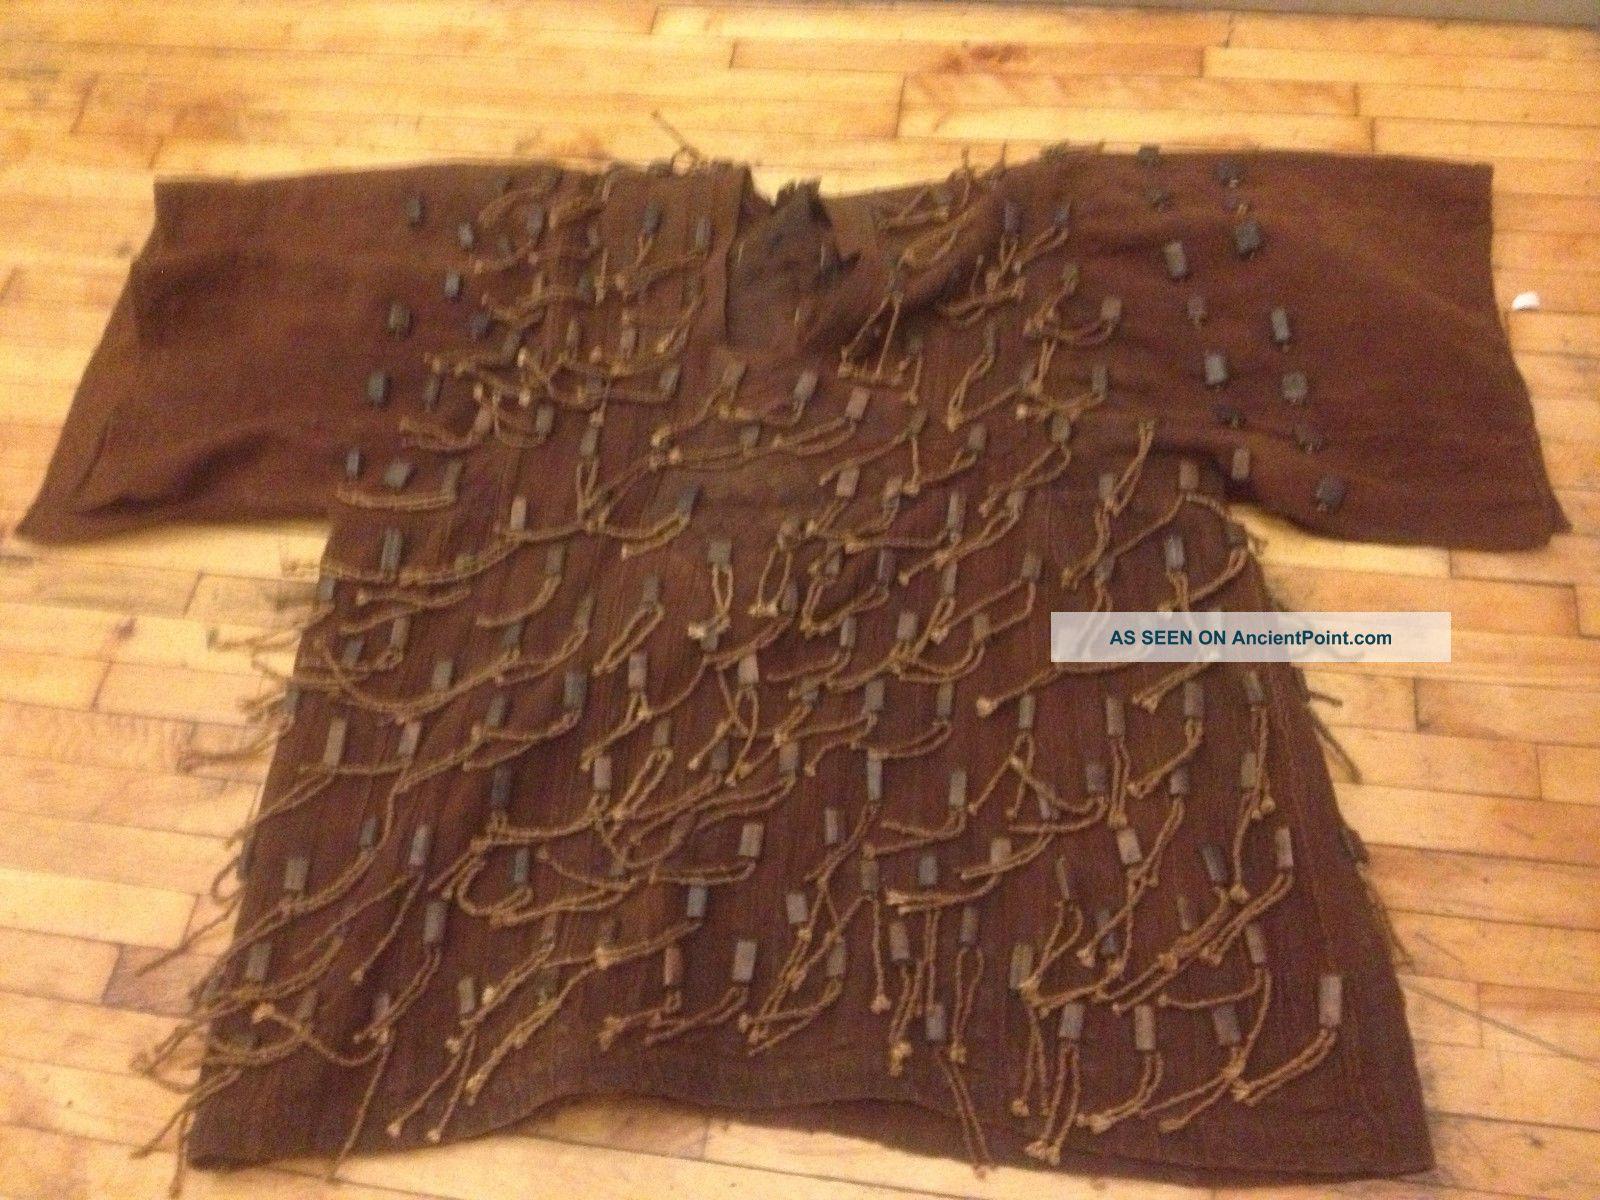 Museum Quality Textile Grisgris Clothing Coat Dance Shaman Costume Guinea Ethnix Other photo